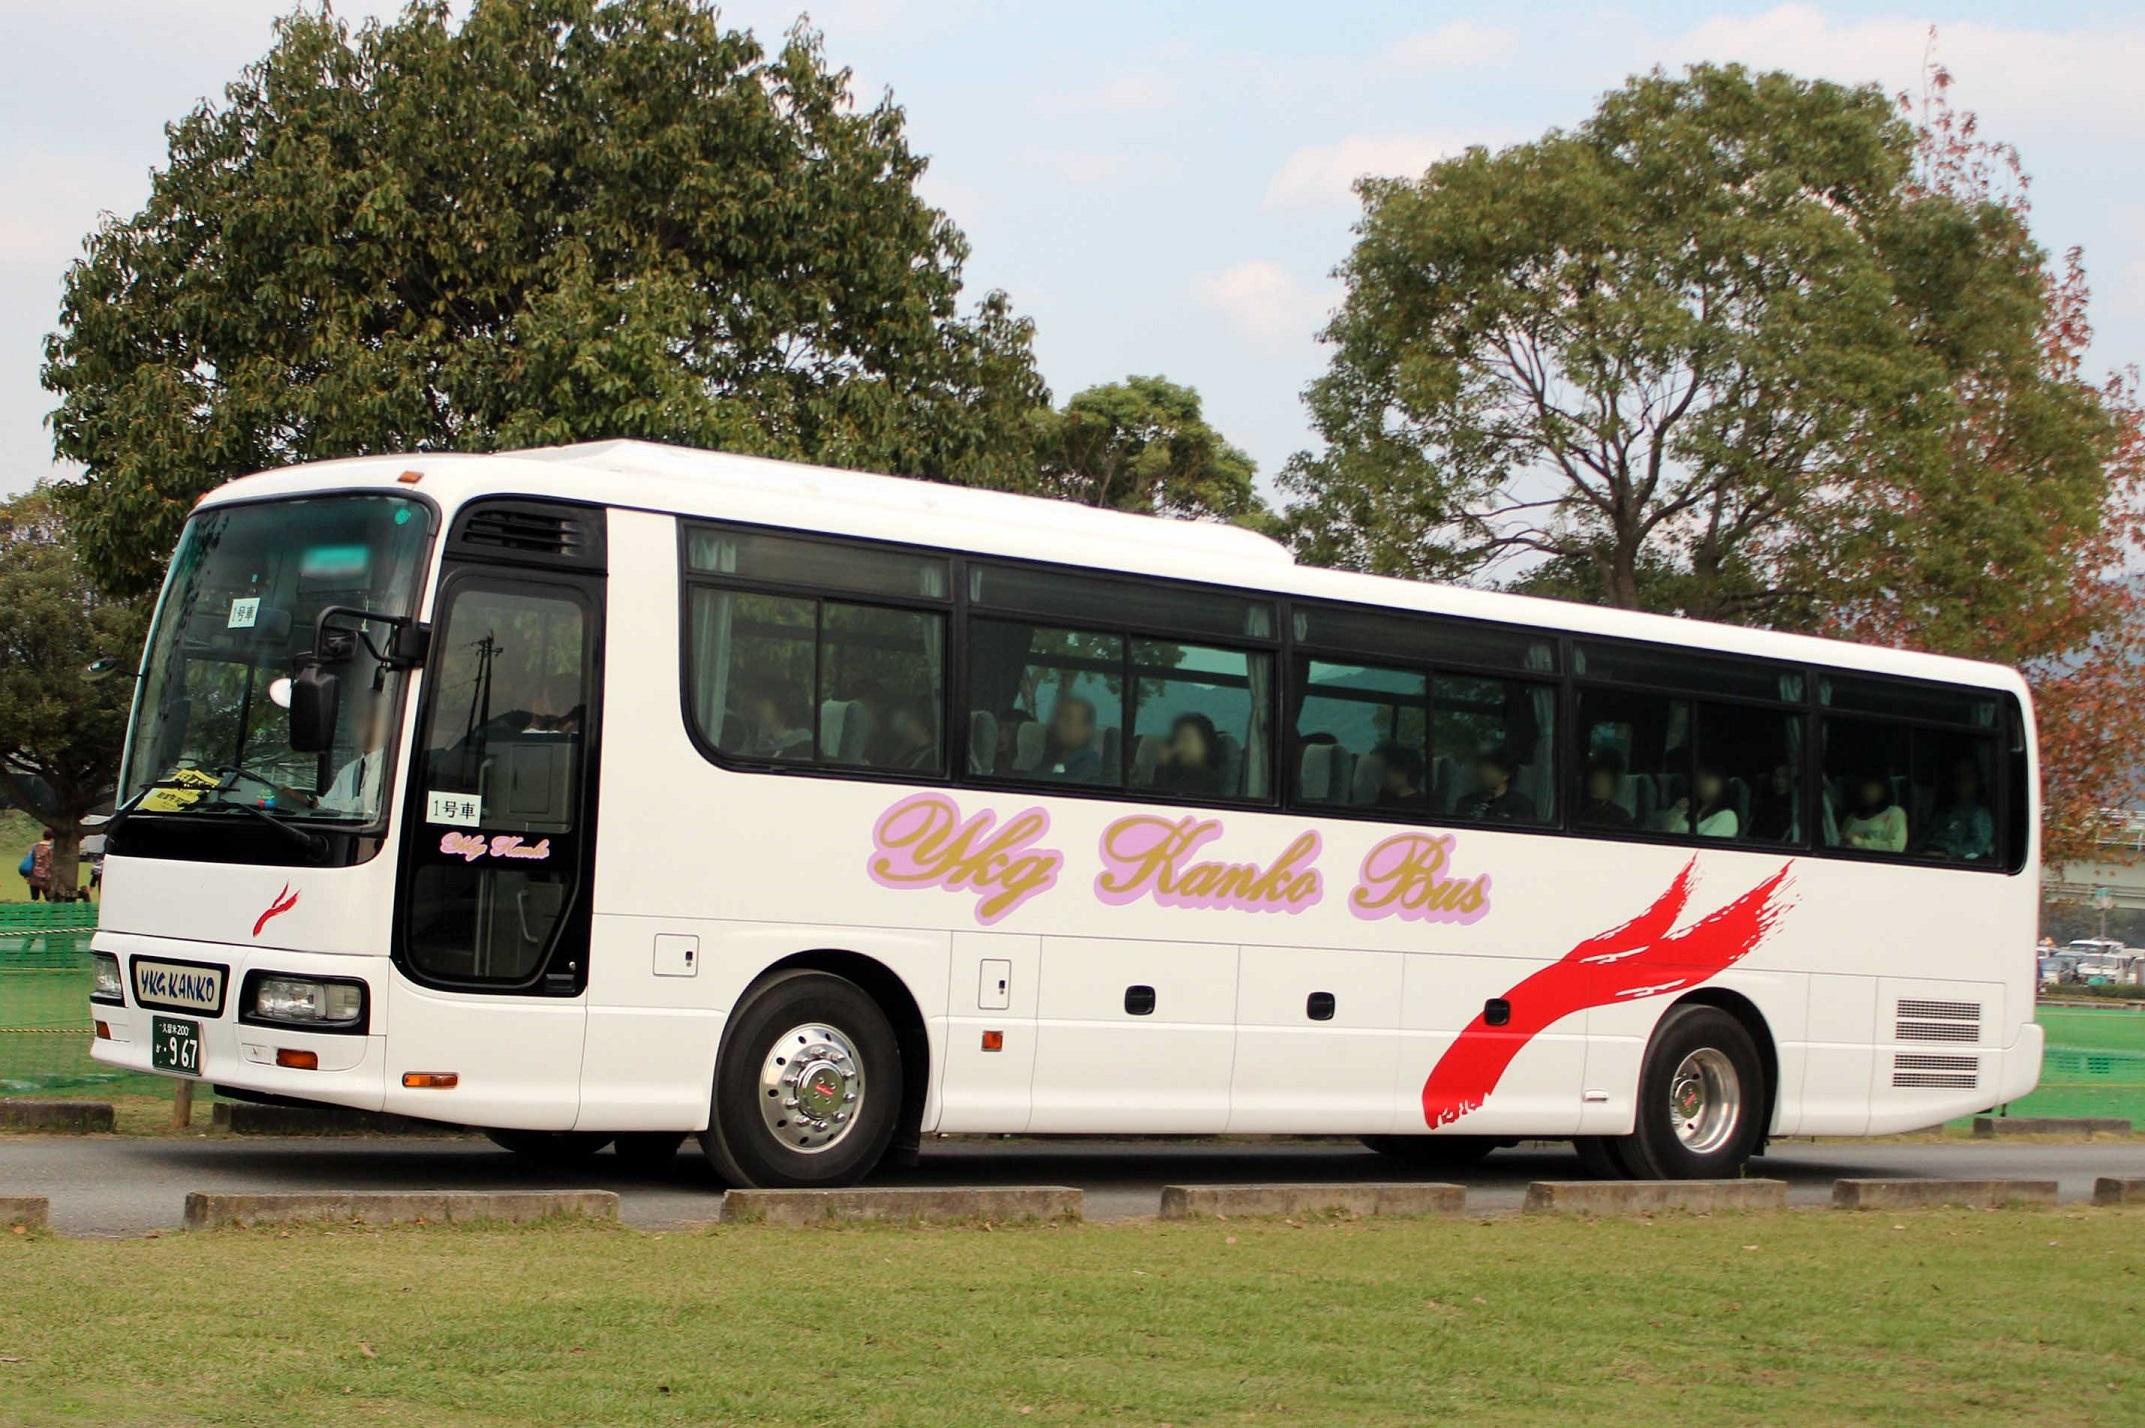 YKG観光バス か967